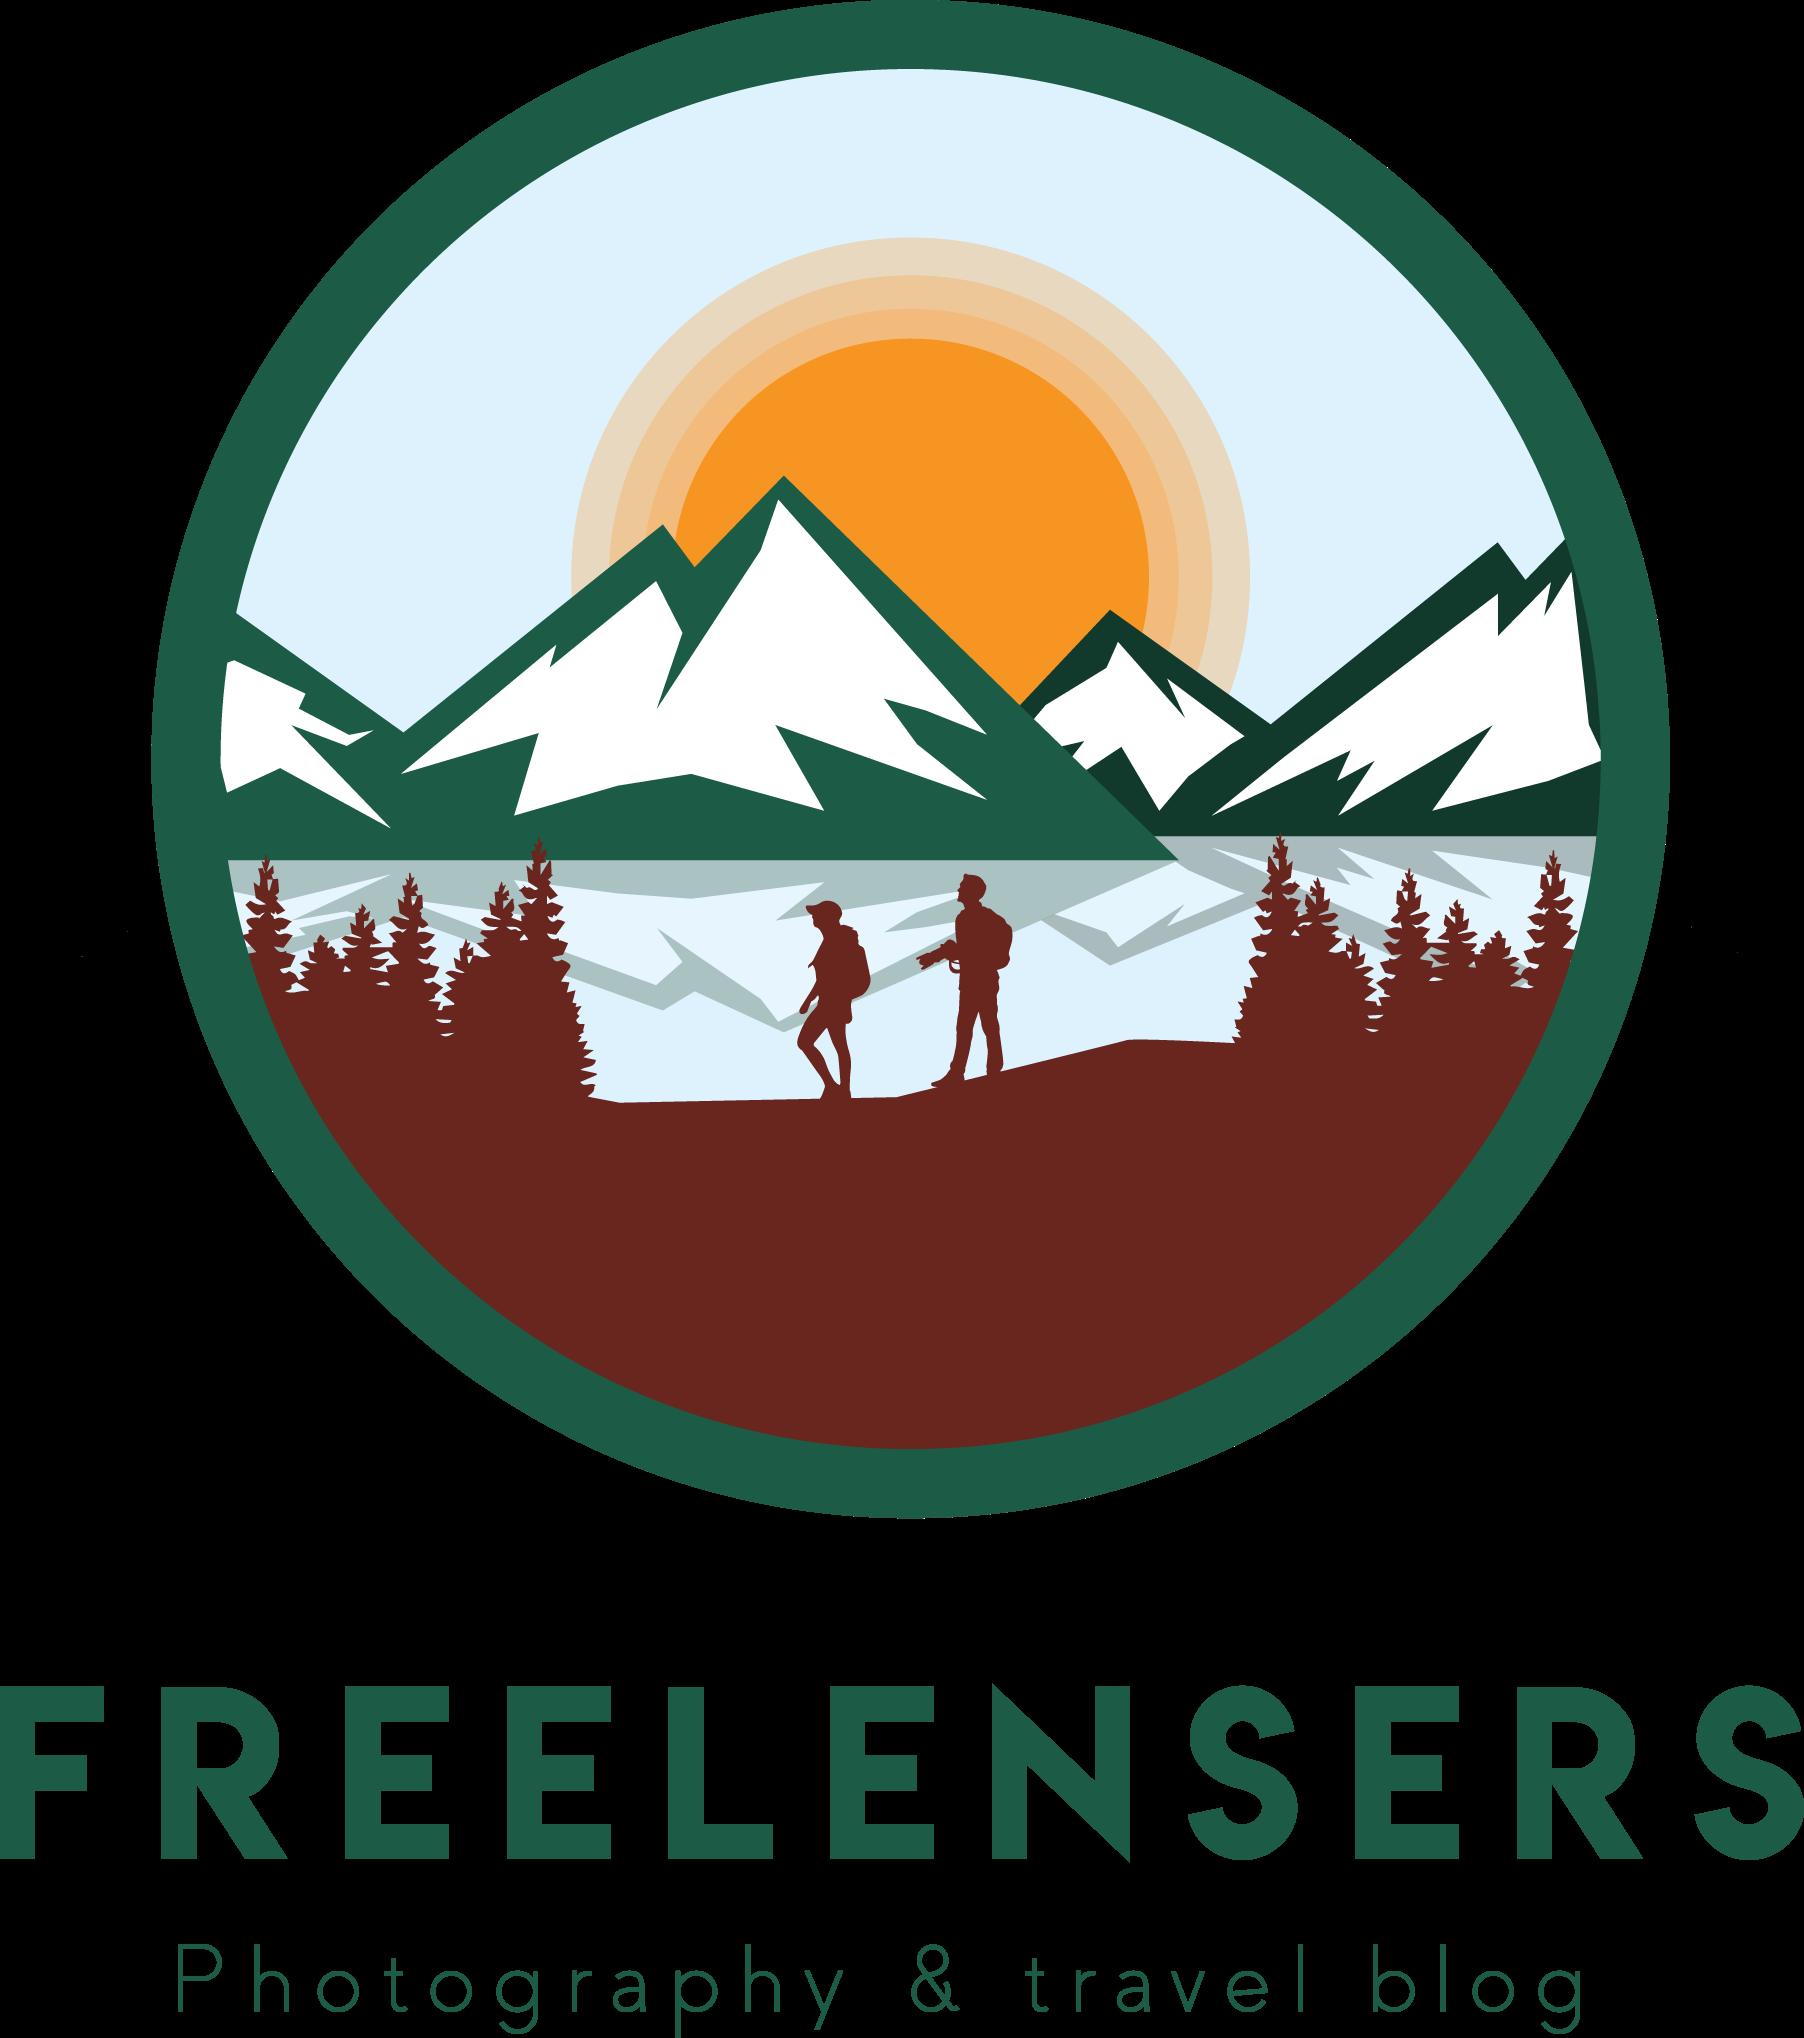 logo freelensers